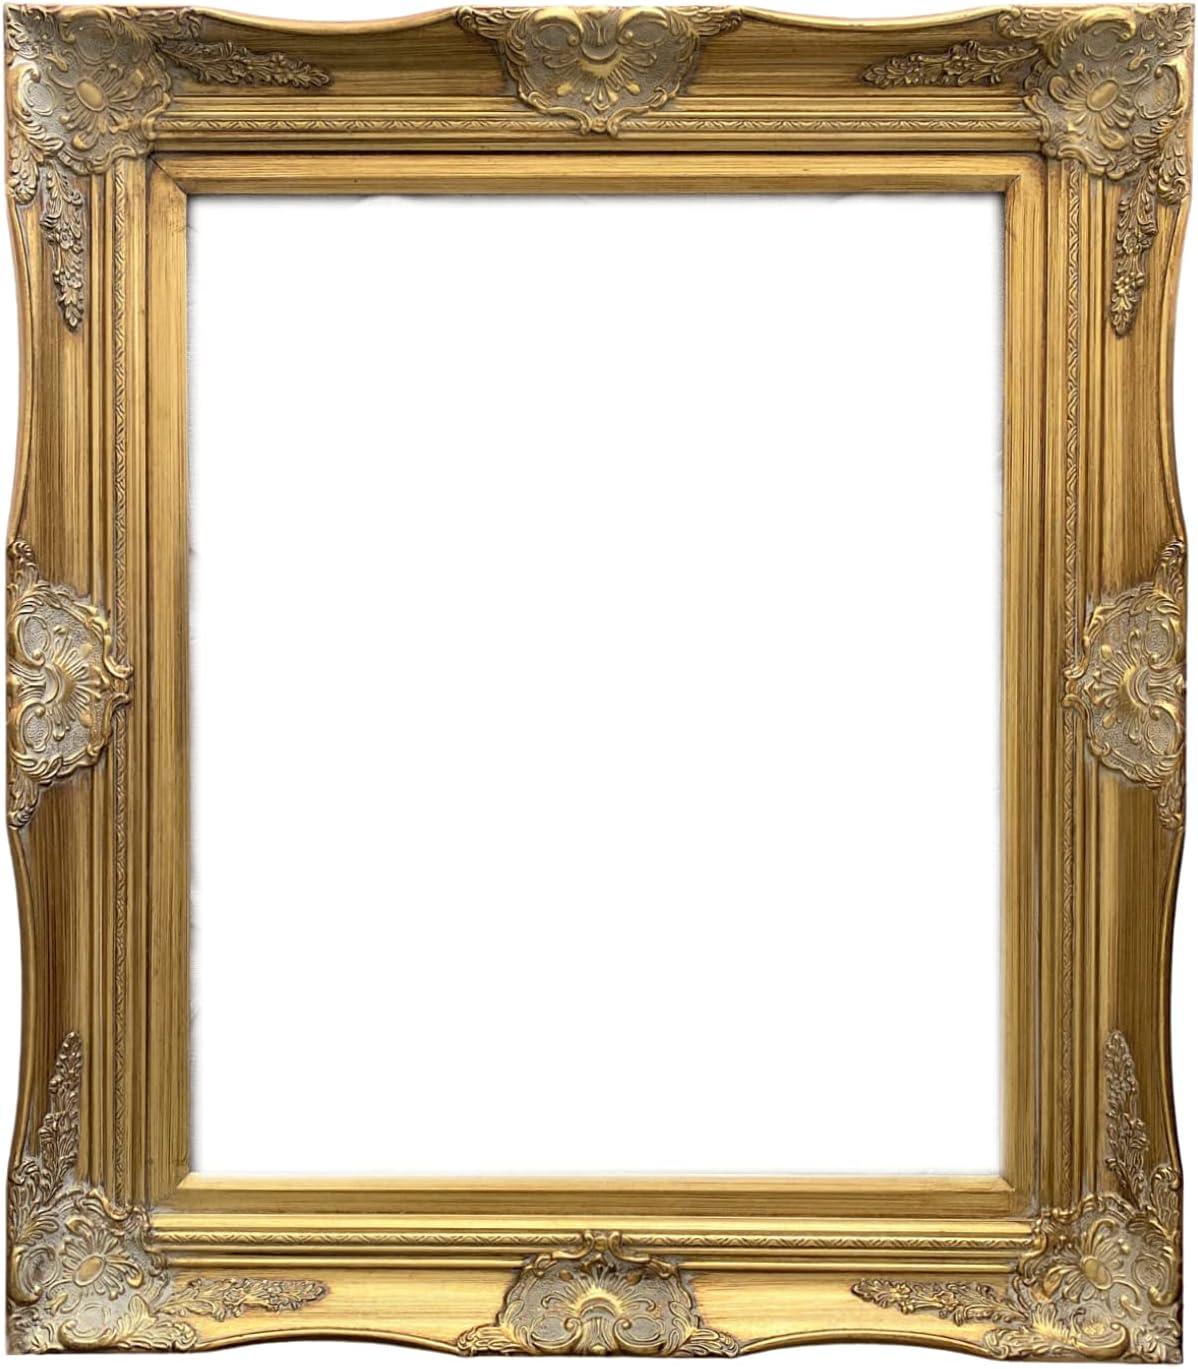 West Frames Georgiana Manufacturer direct delivery Ornate Antique Baroq Detroit Mall Wood French Leaf Gold